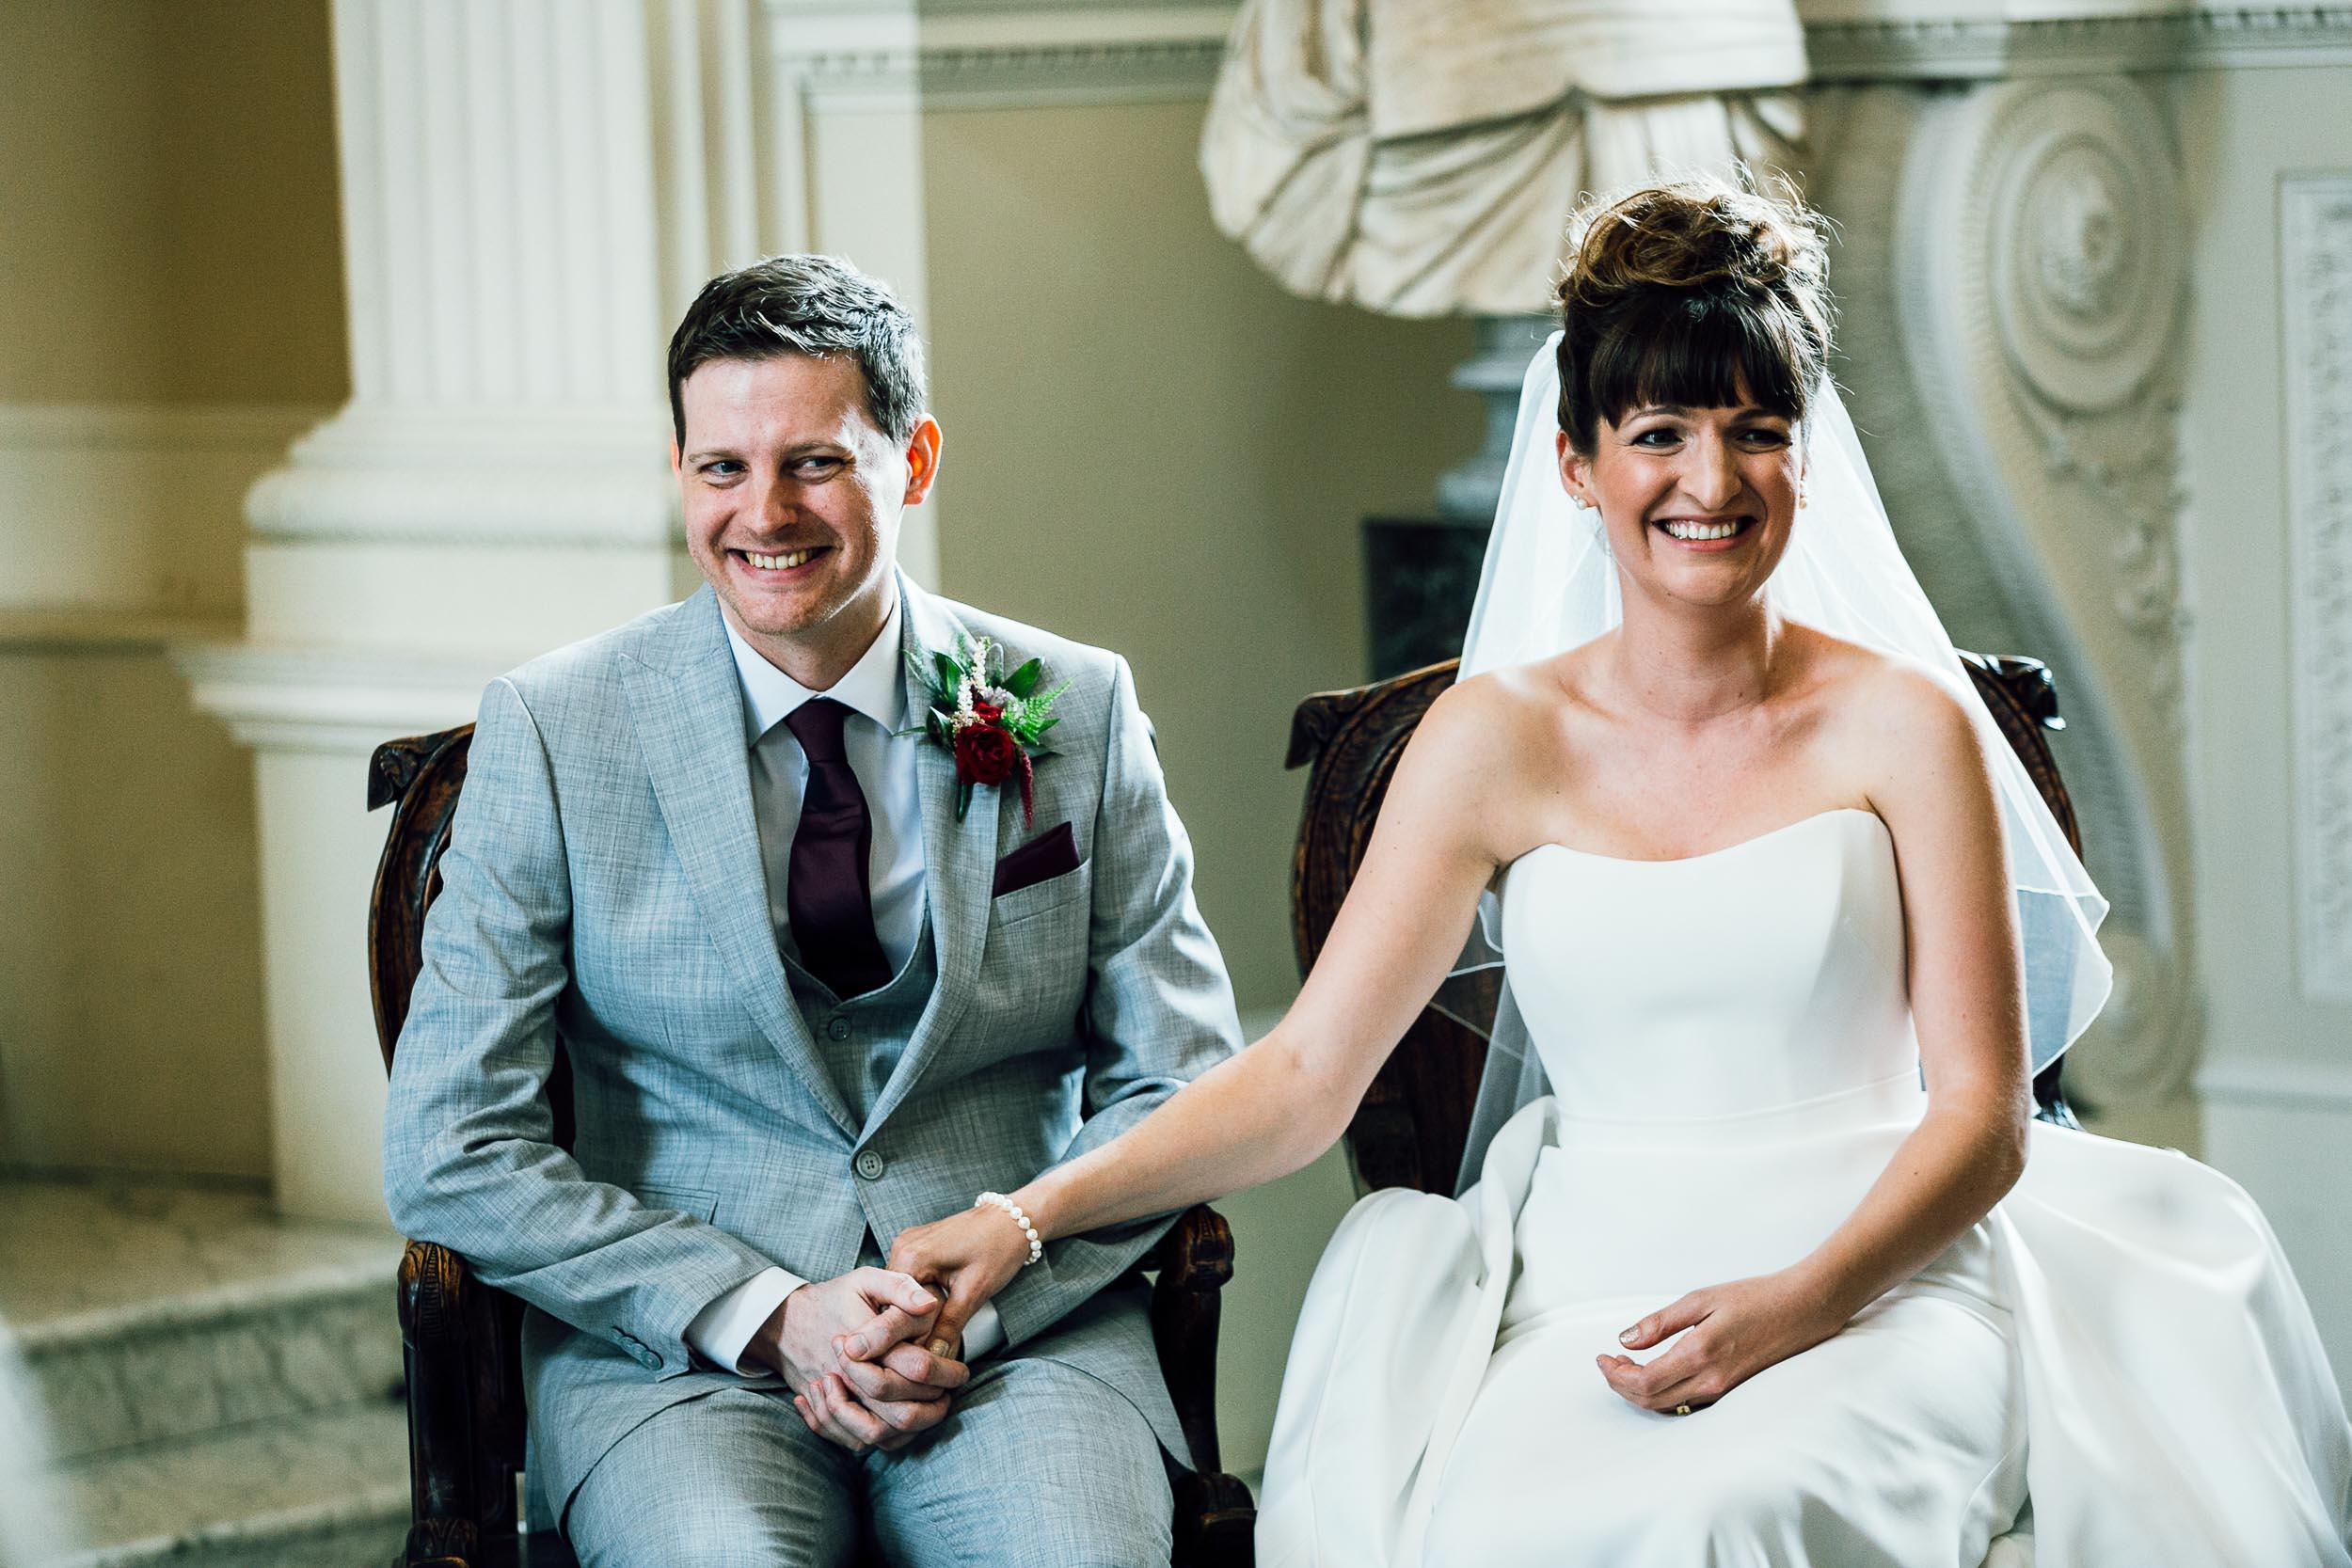 syon-house-wedding-photographer-london 055.jpg